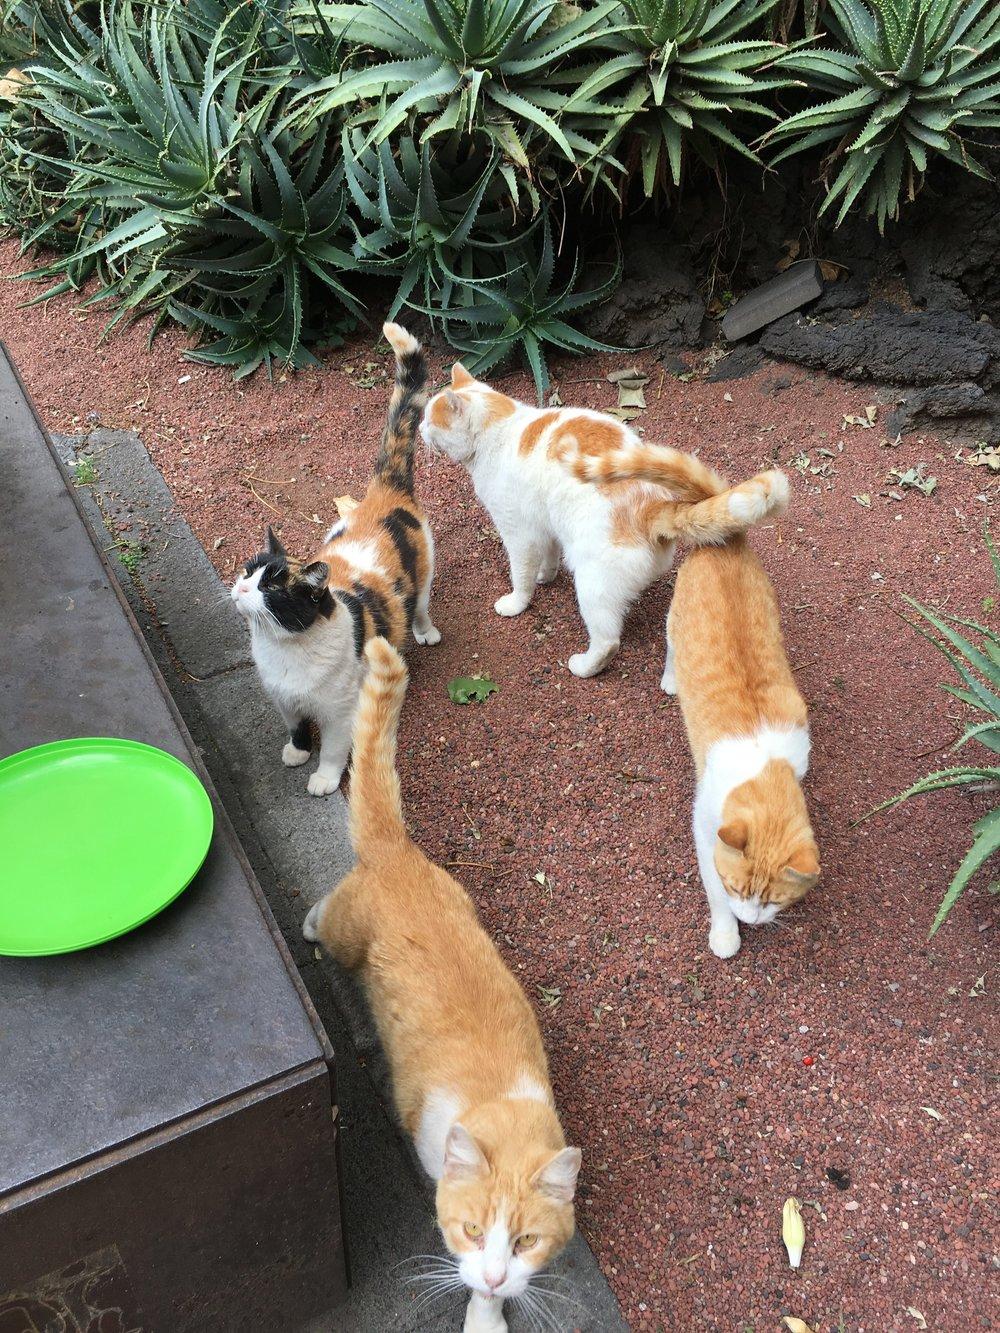 Some of the cats at the Palacio Nacional